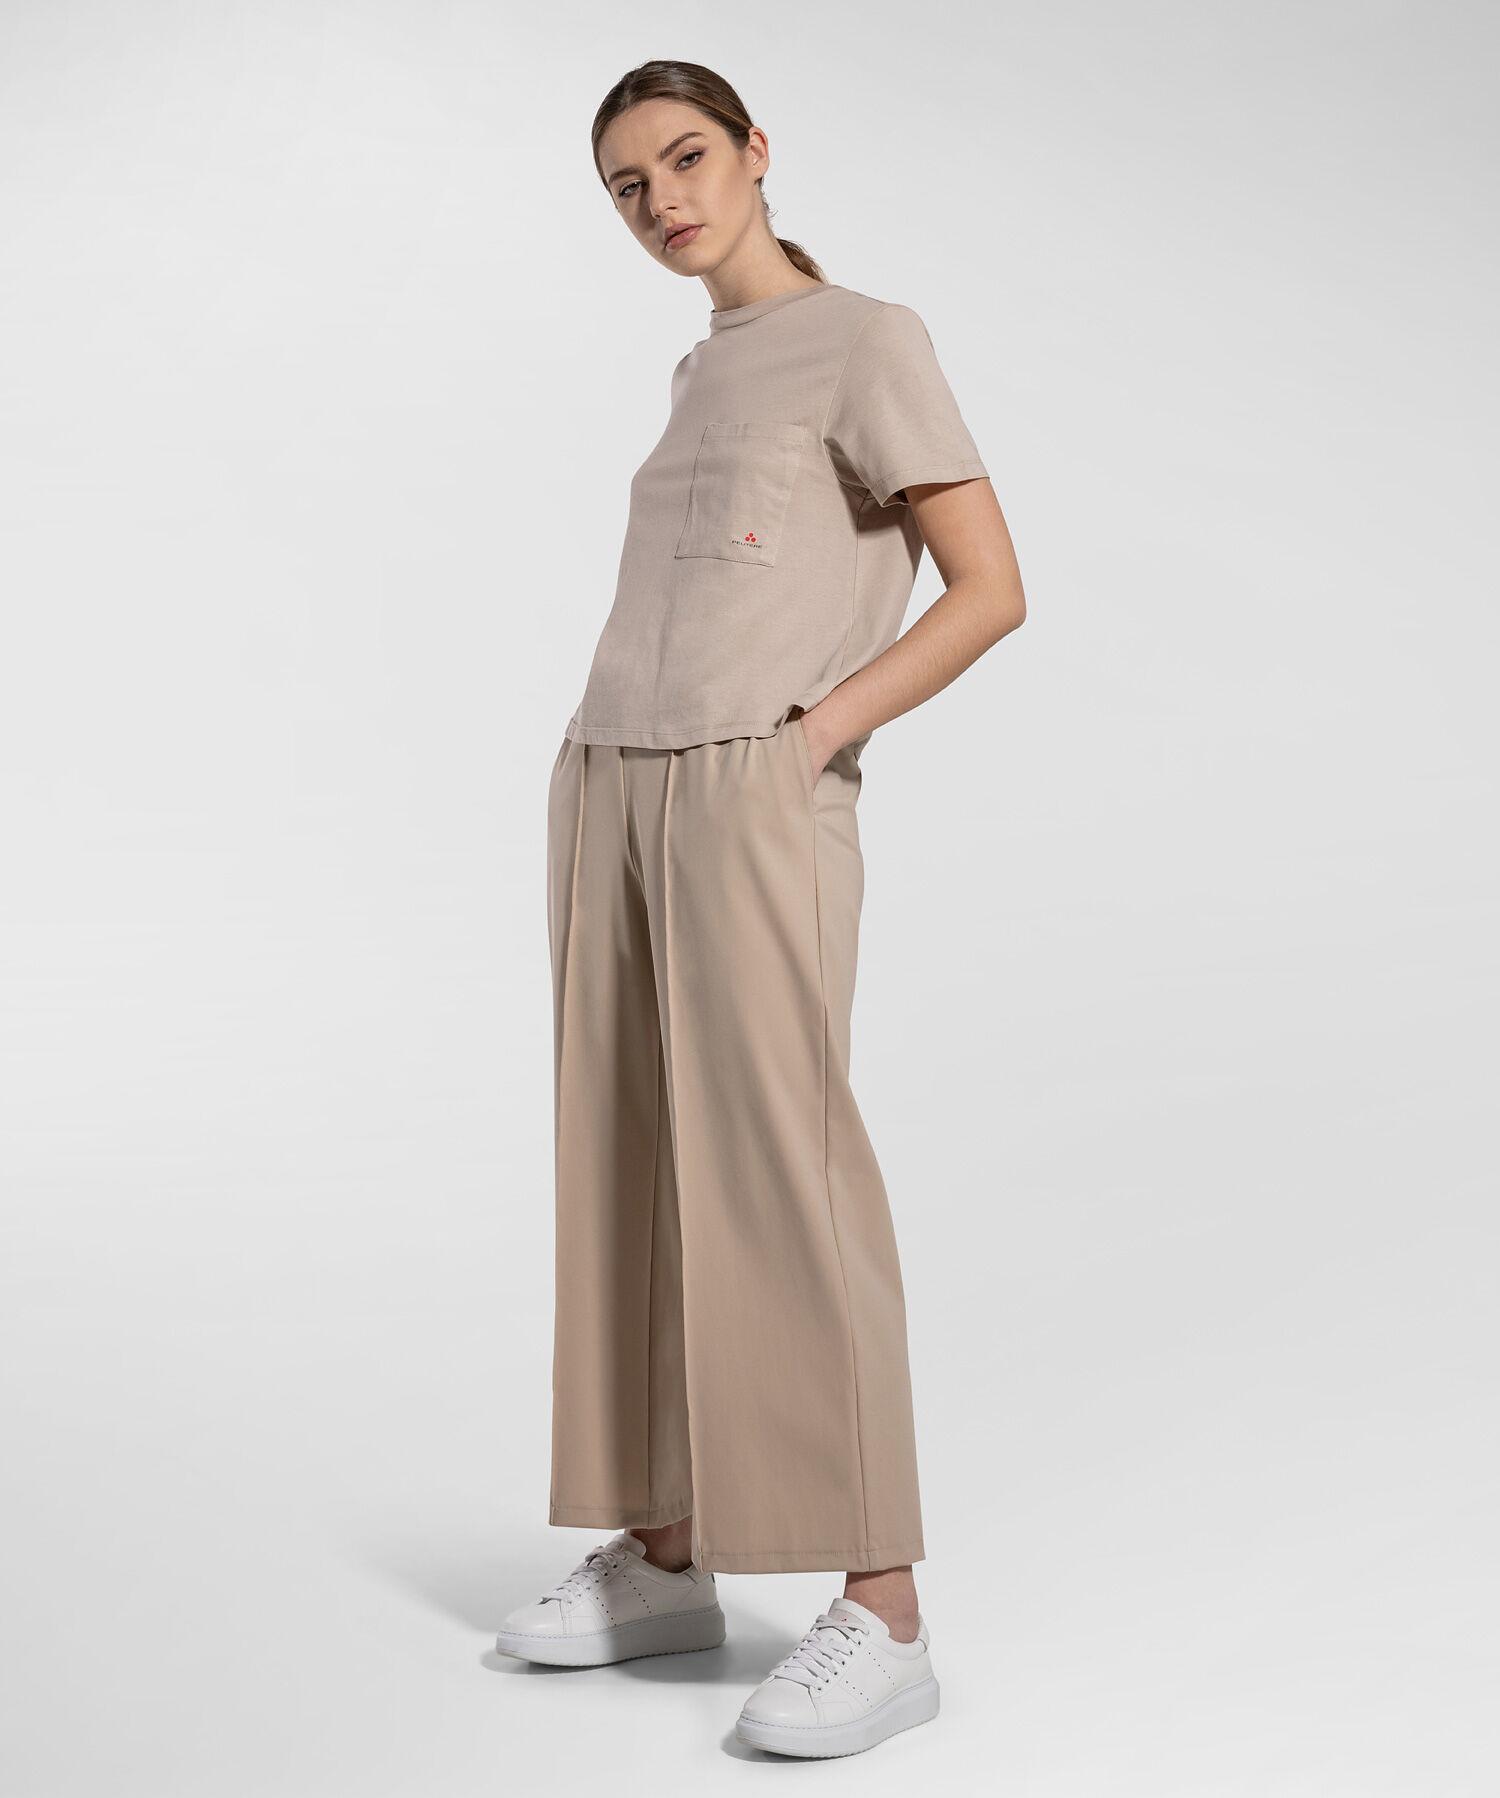 T-Shirt Con Tasca Applicata - Peuterey